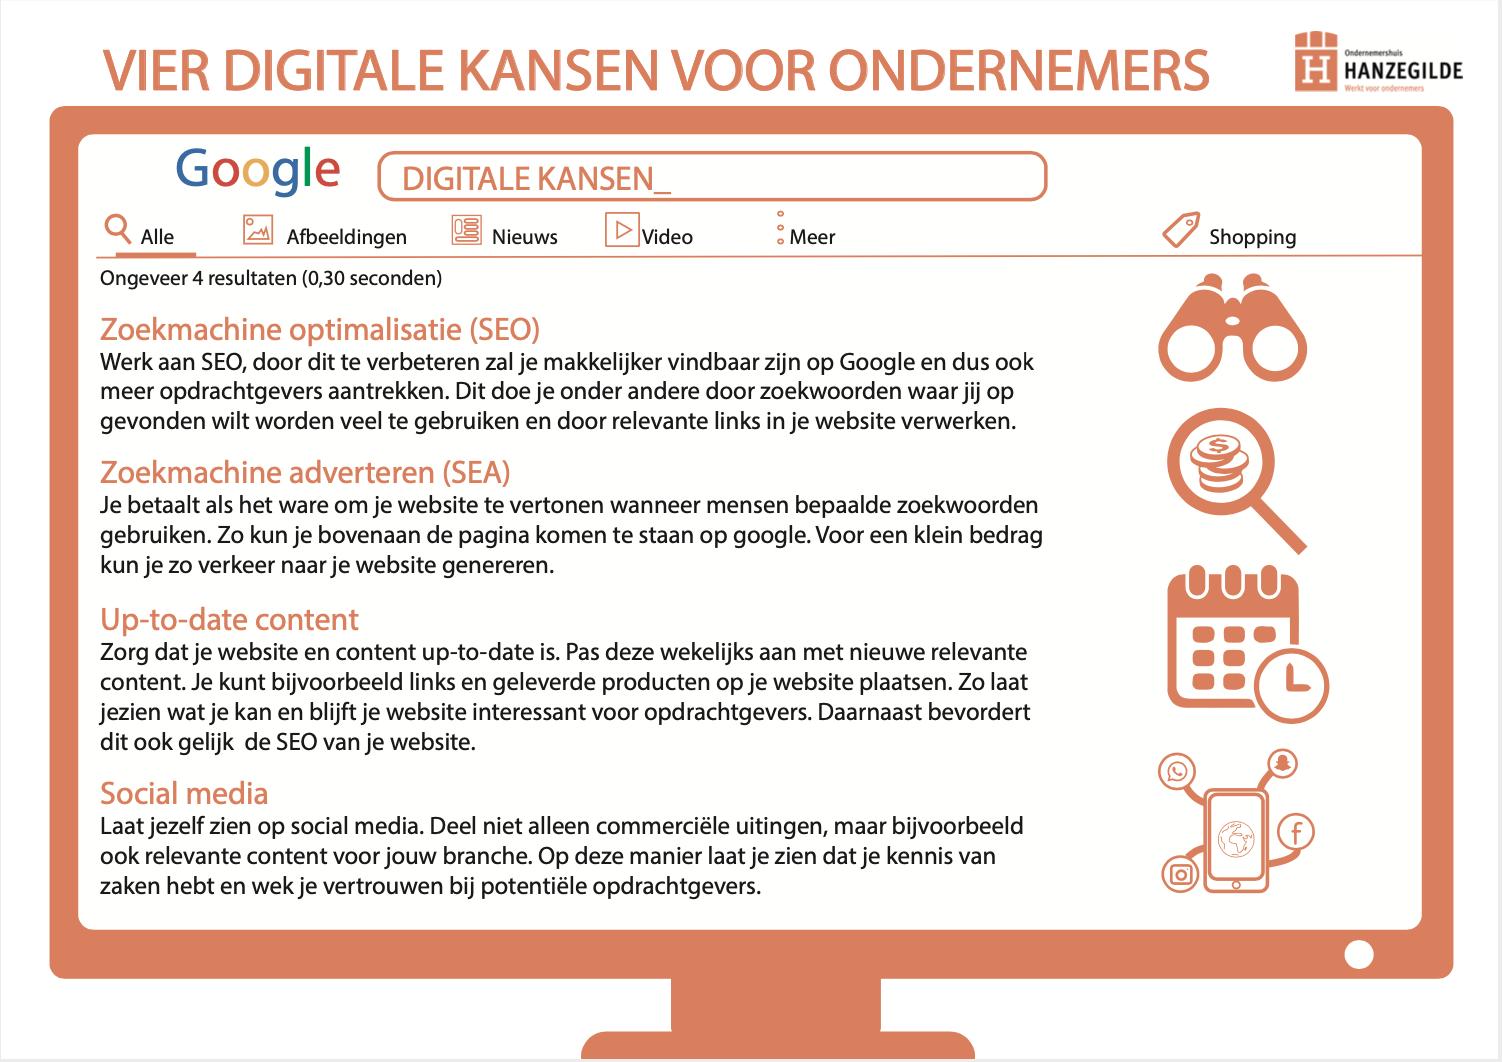 Digitale kansen voor ondernemers